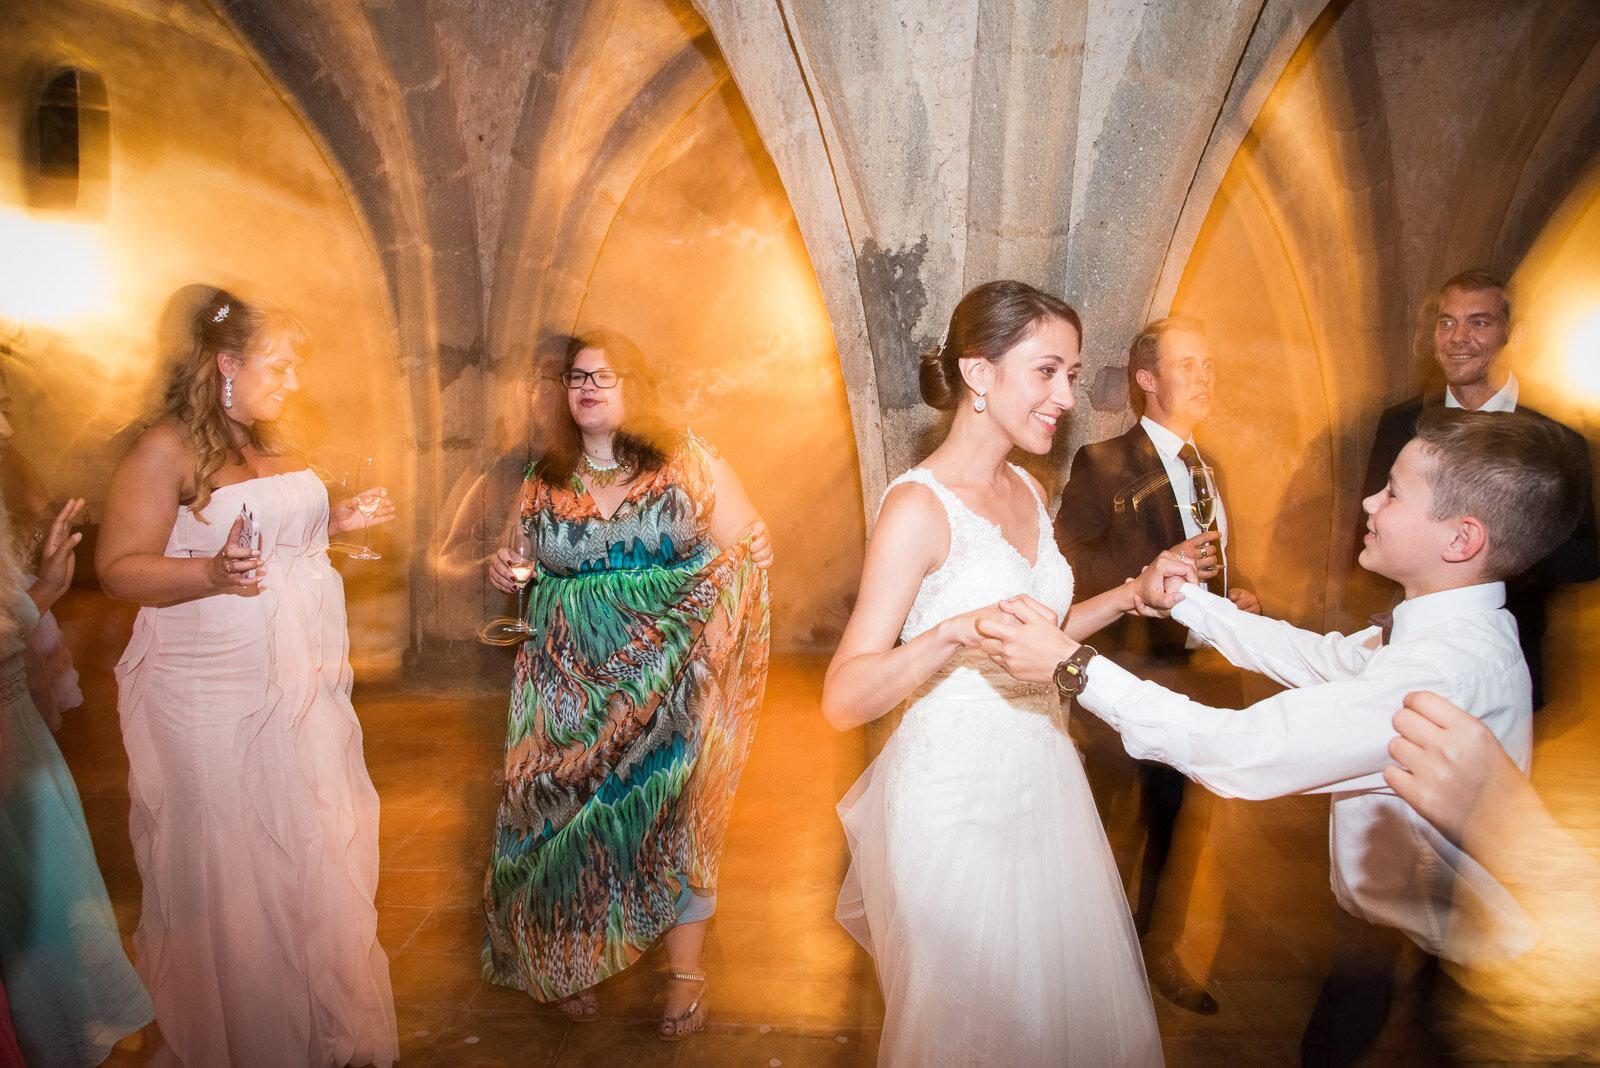 Russian Wedding in Villa Cimbrone Costiera Amalfitana 32.jpg